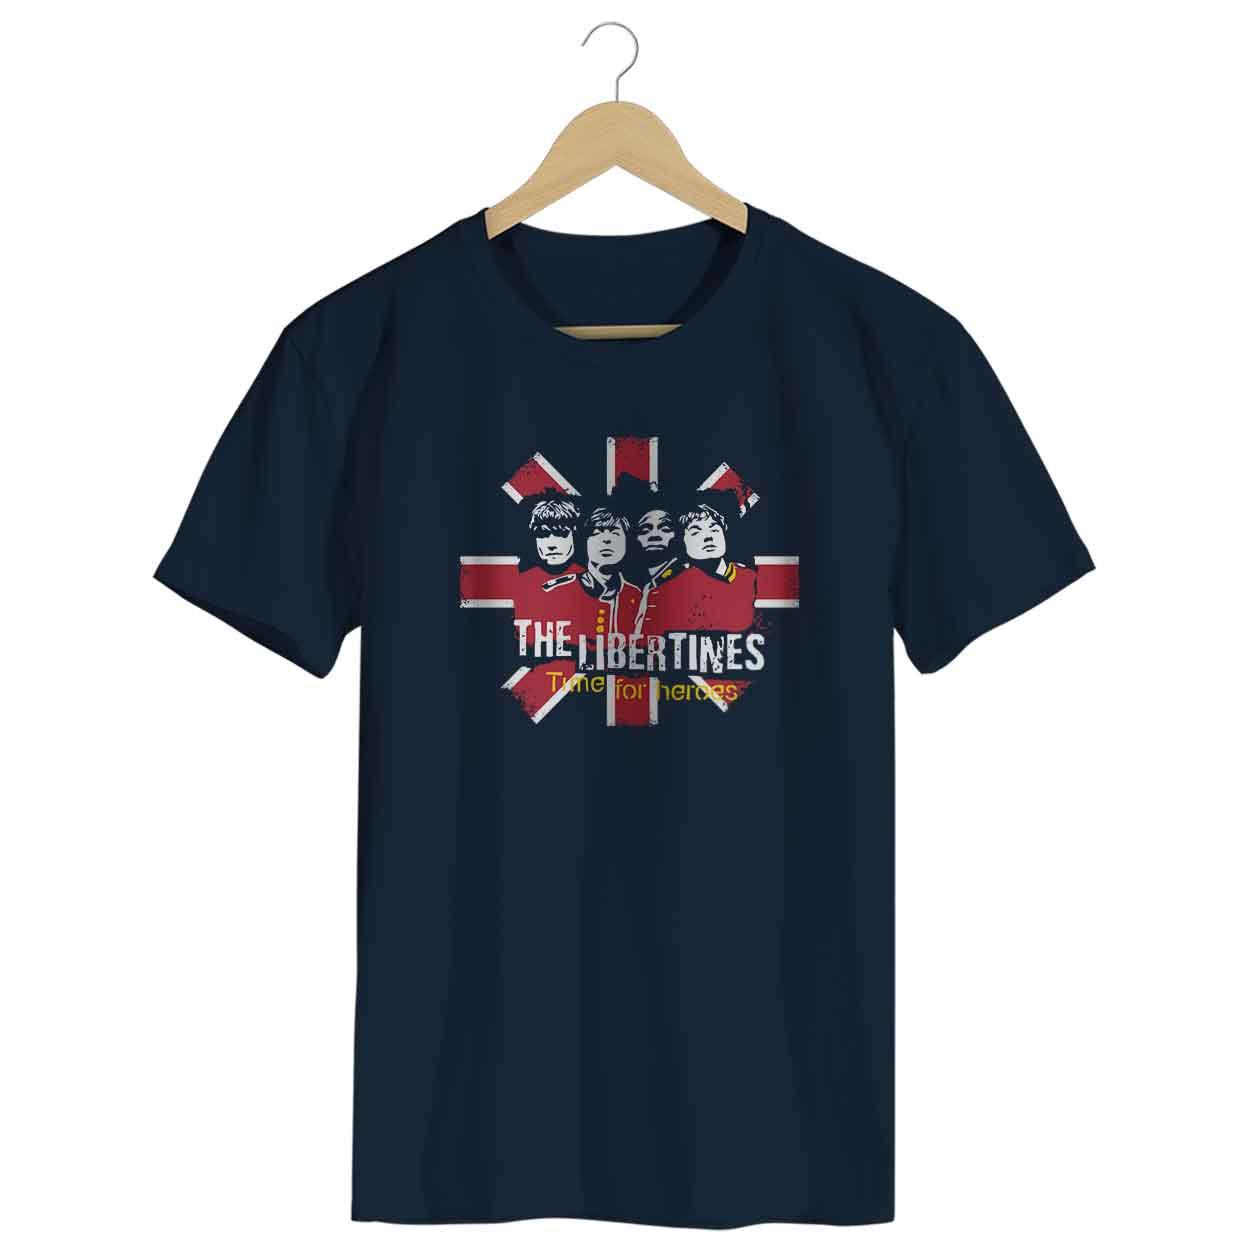 Camiseta - Time for Heroes - The Libertines - Masculino